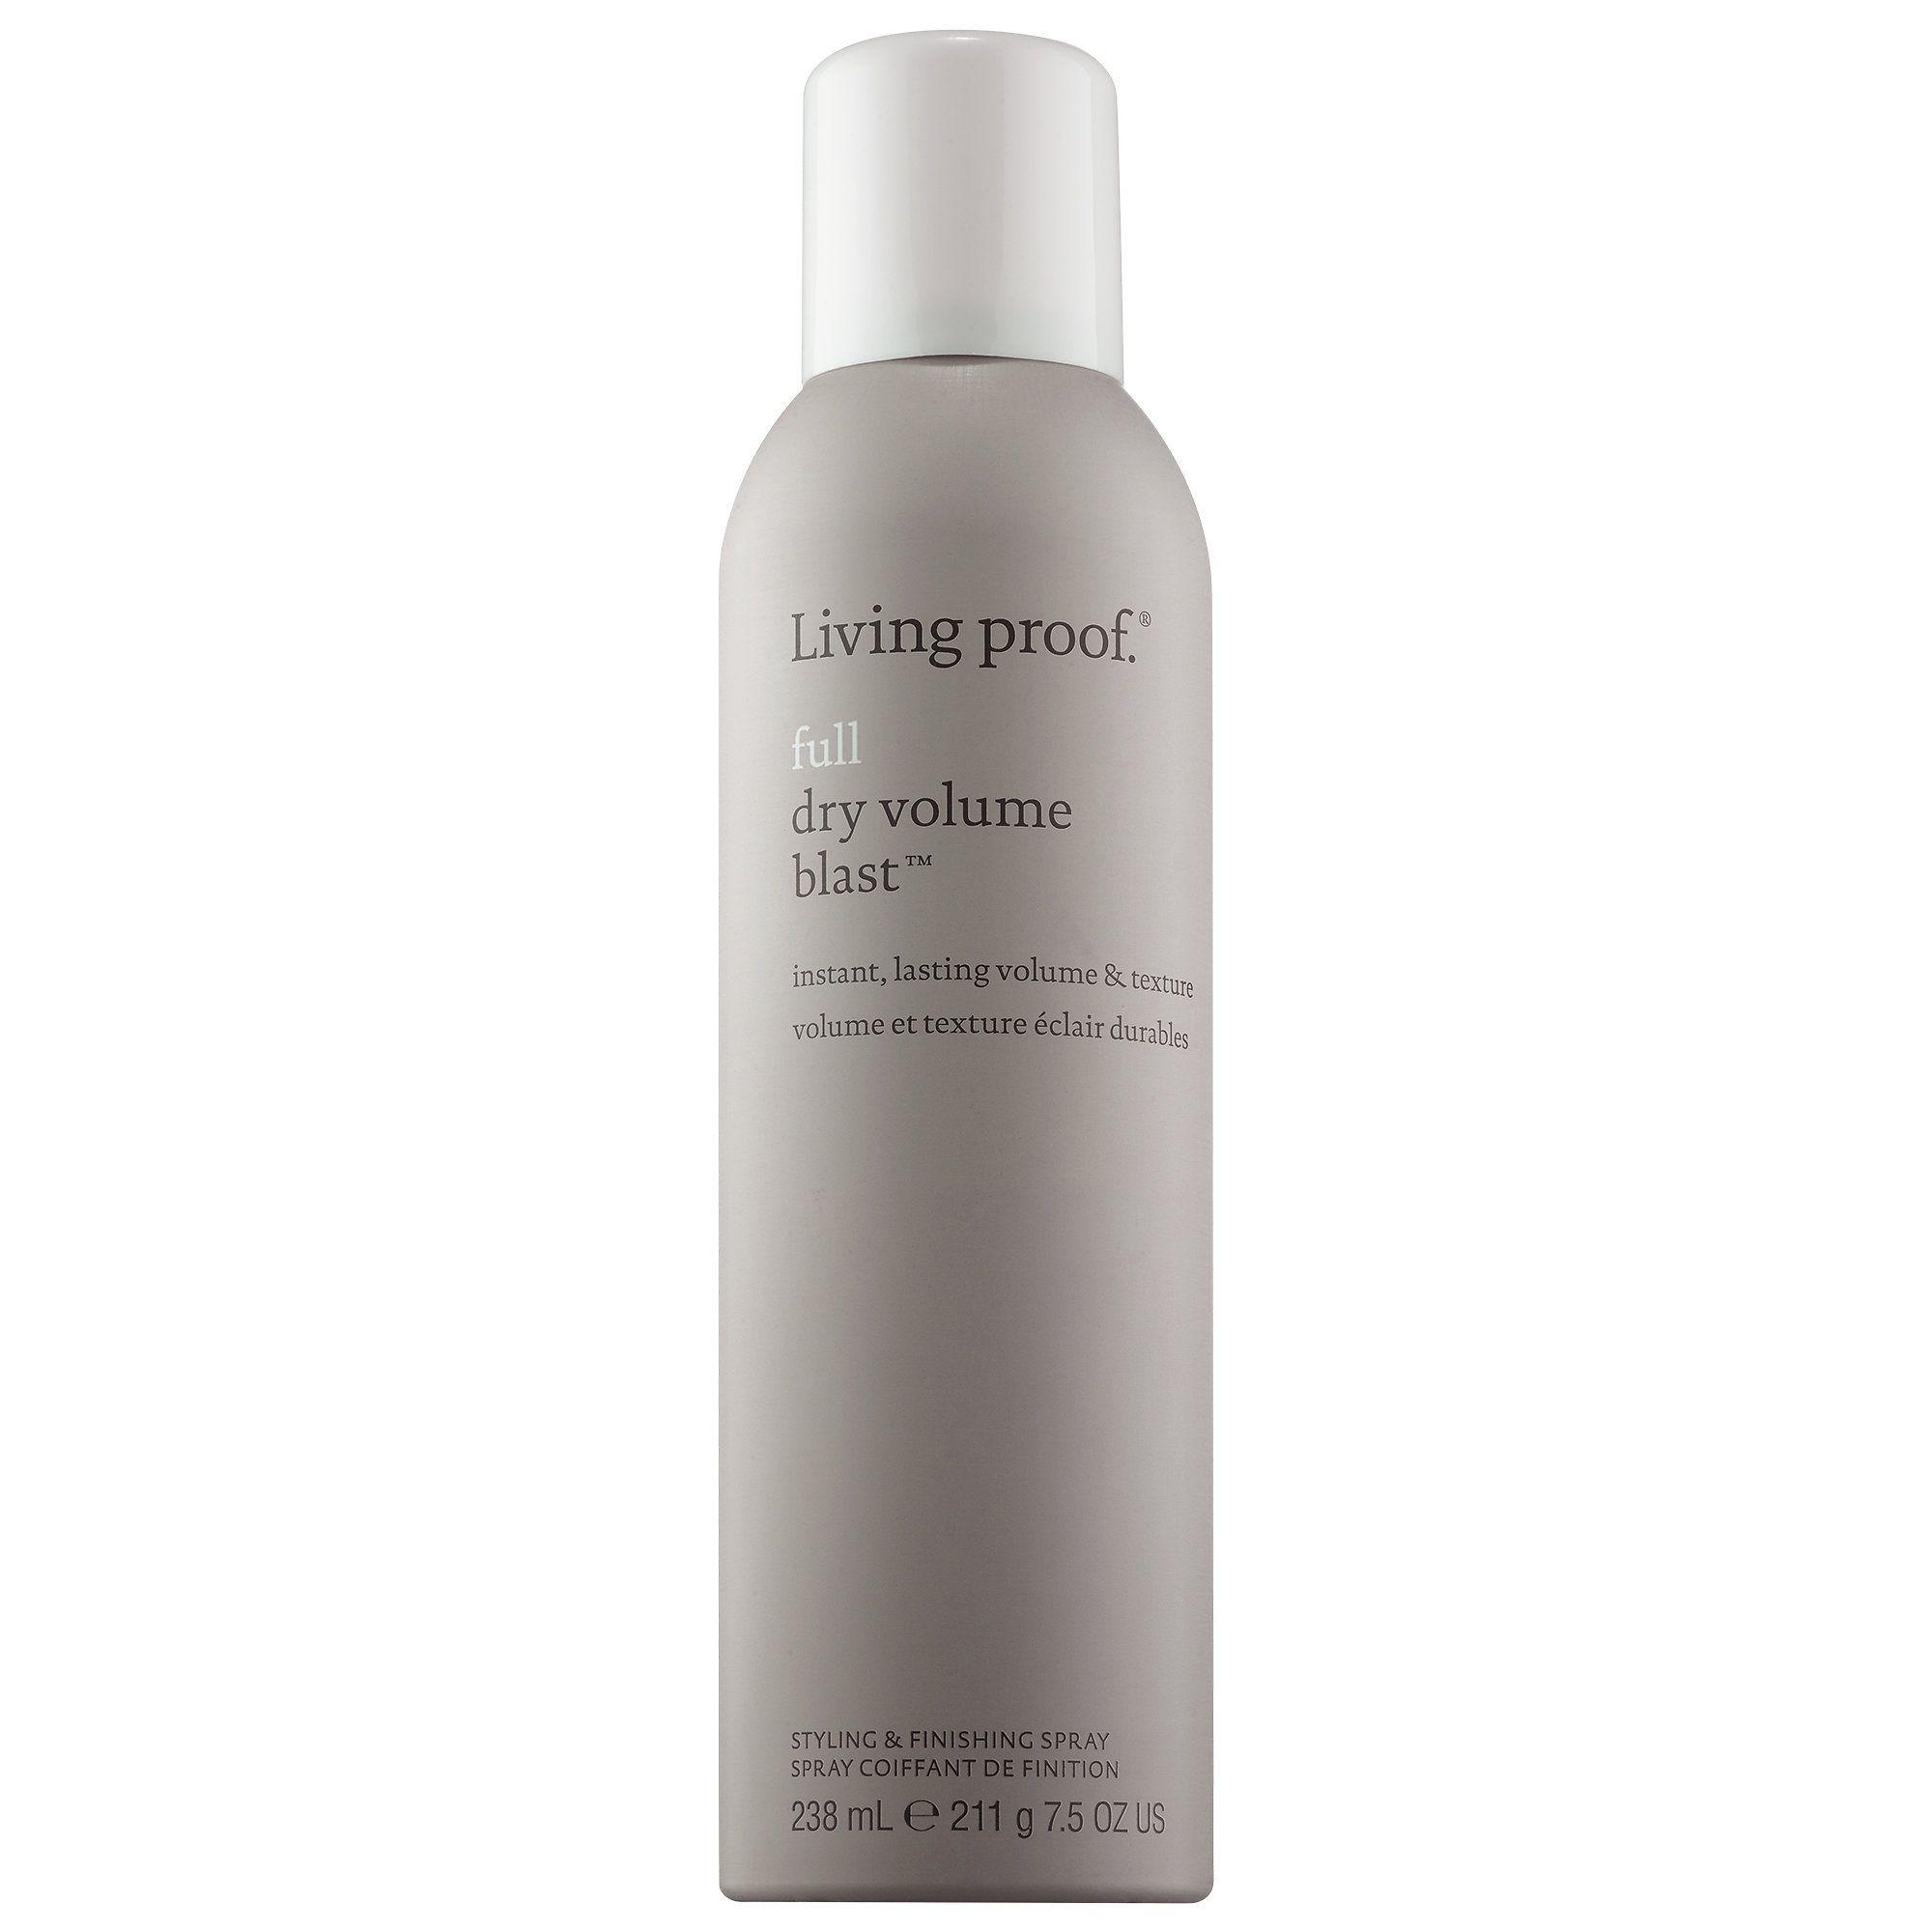 Shop Living Proofus Full Dry Volume Blast at Sephora The spray